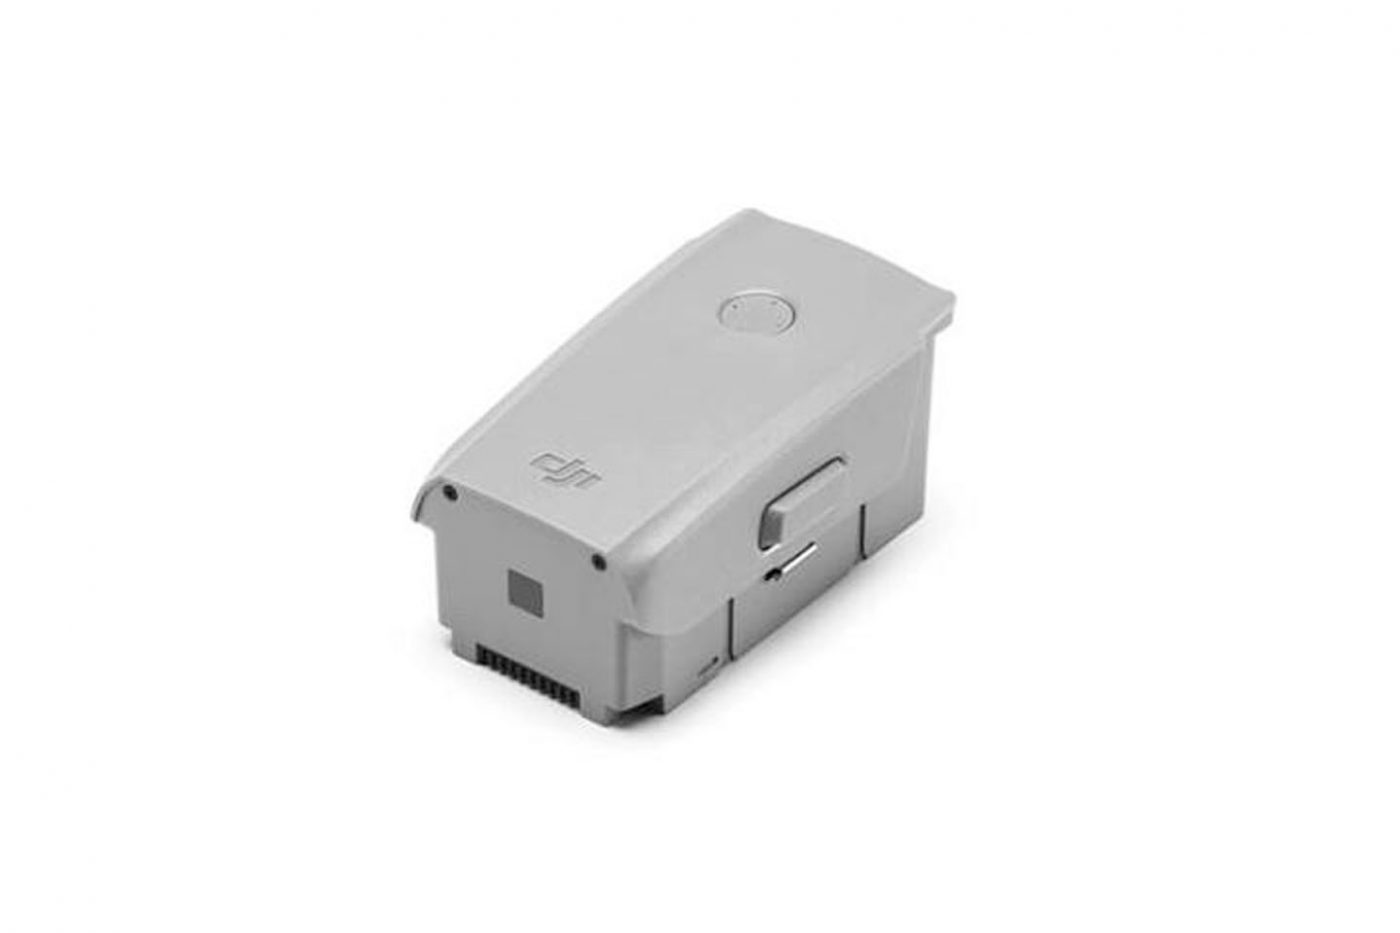 MAVIC AIR2/DJI Air2Sバッテリー